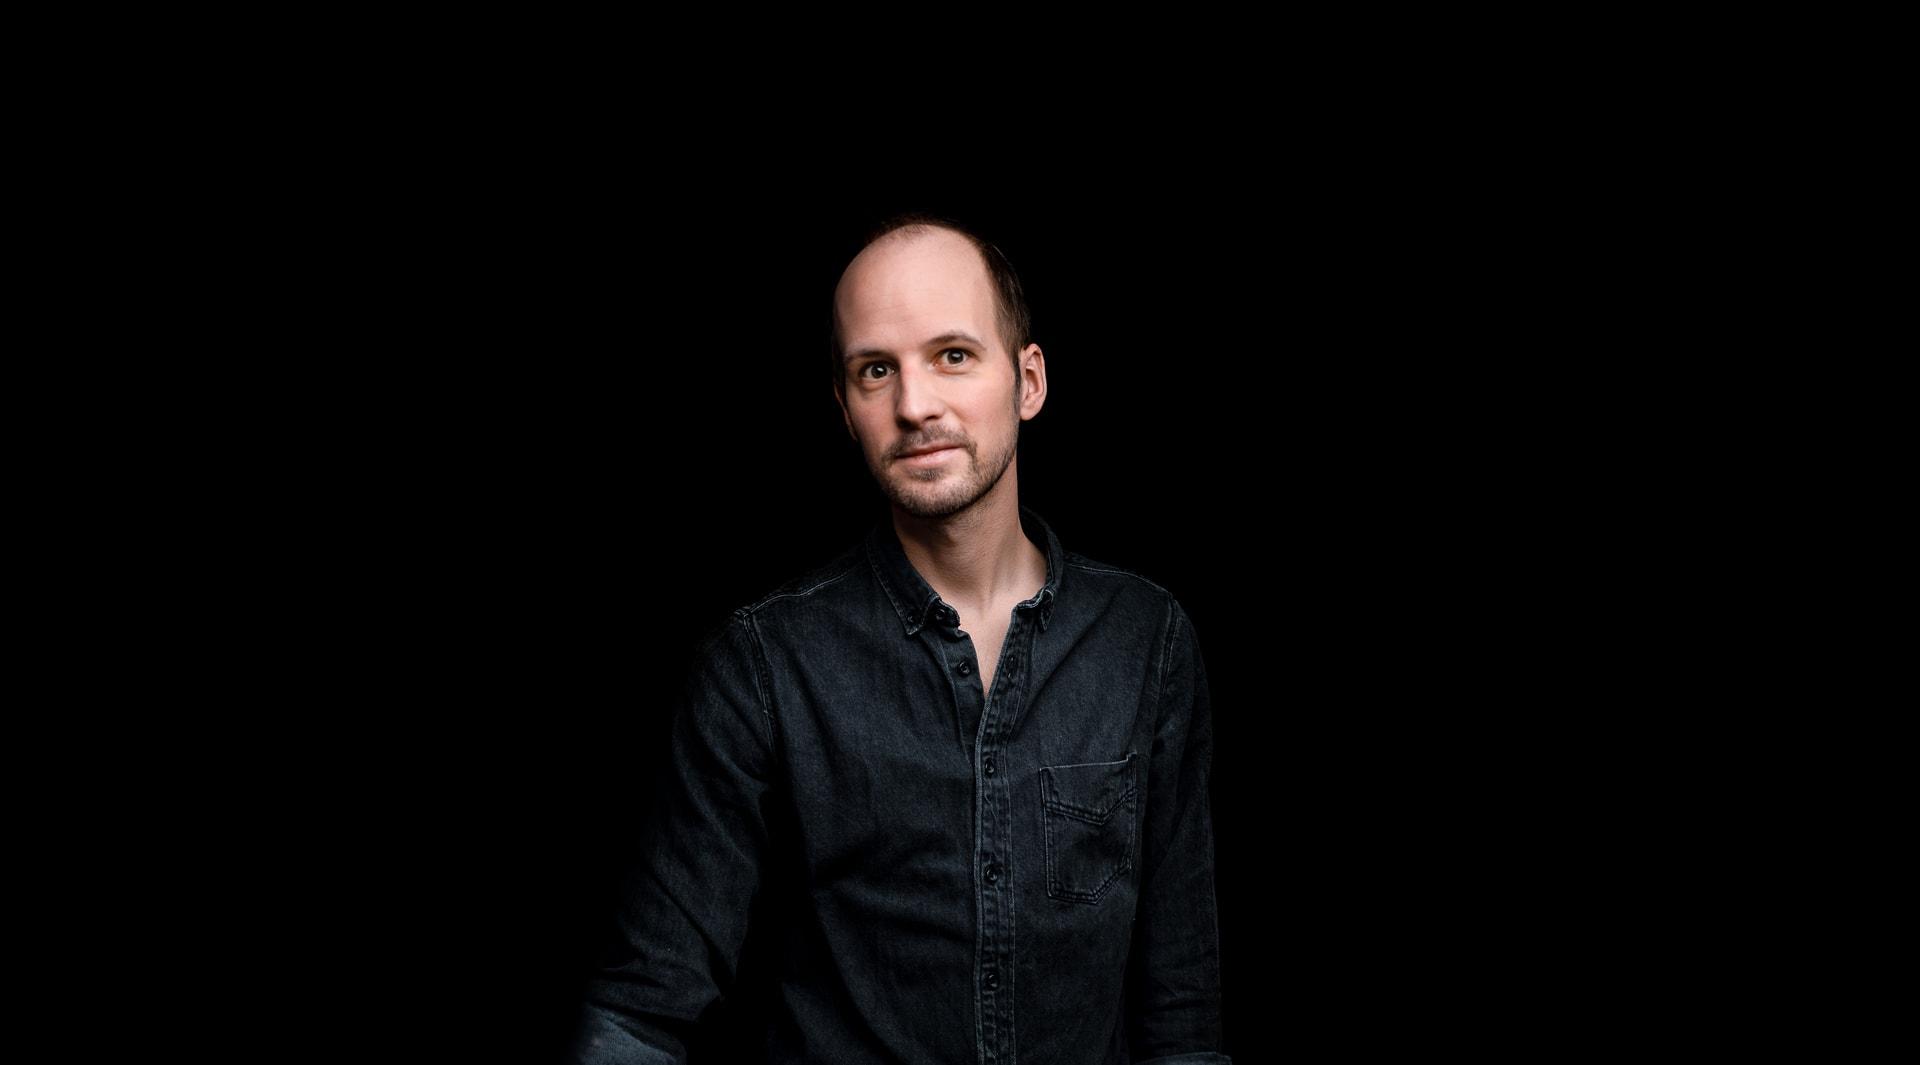 Christian Prinz